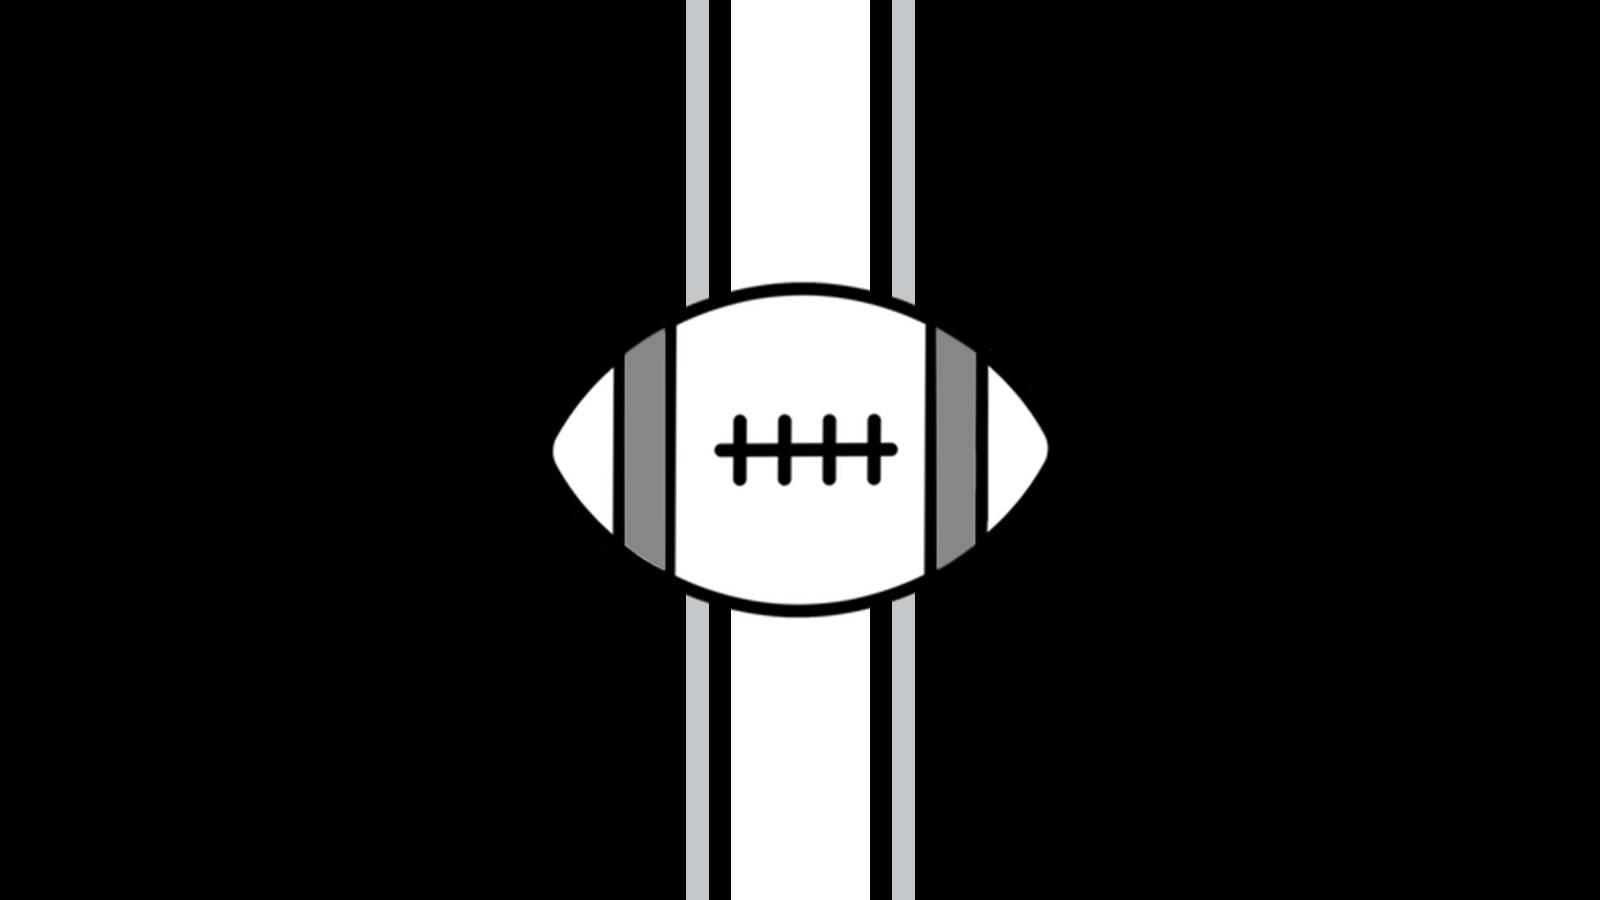 2020 Las Vegas Raiders Season Tickets (Includes Tickets To All Regular Season Home Games)